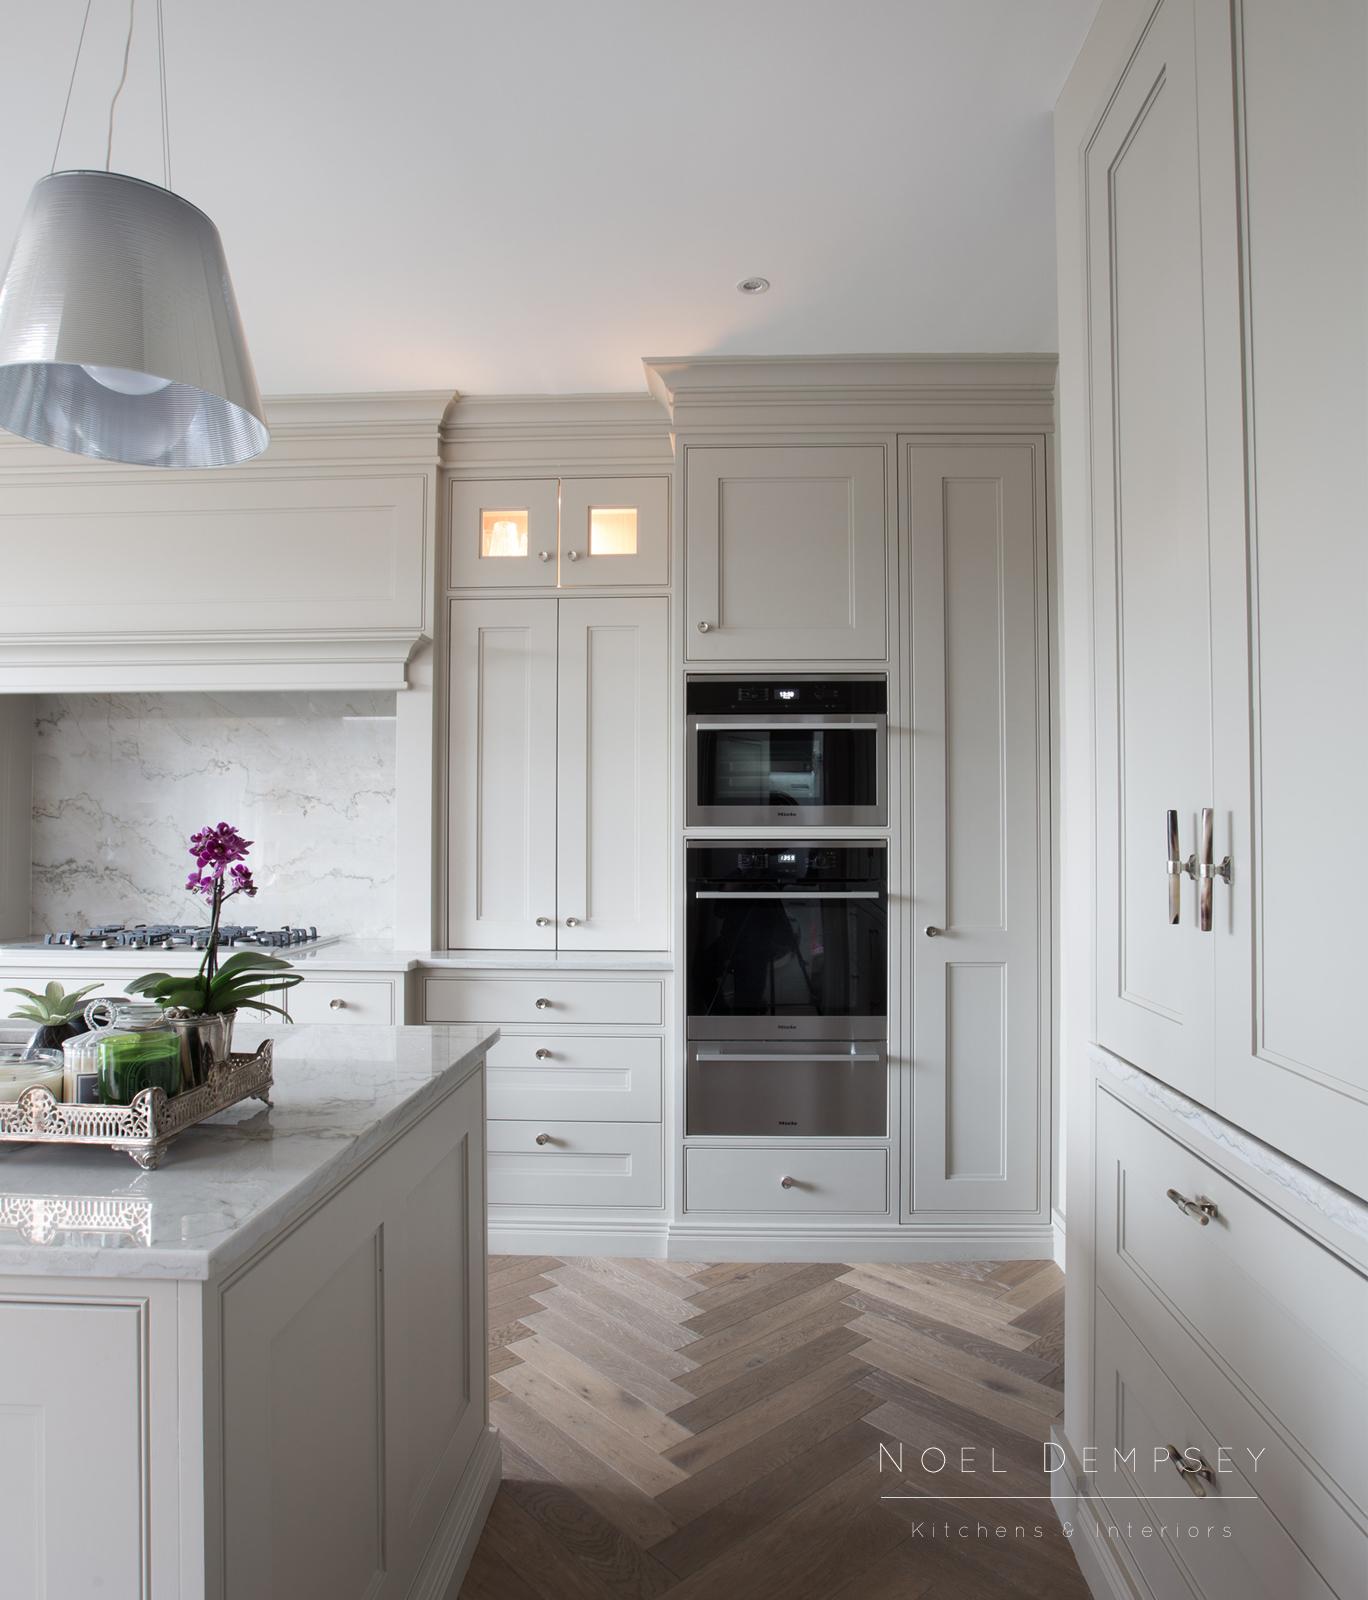 Dartry-Painted-Kitchens-6.jpg